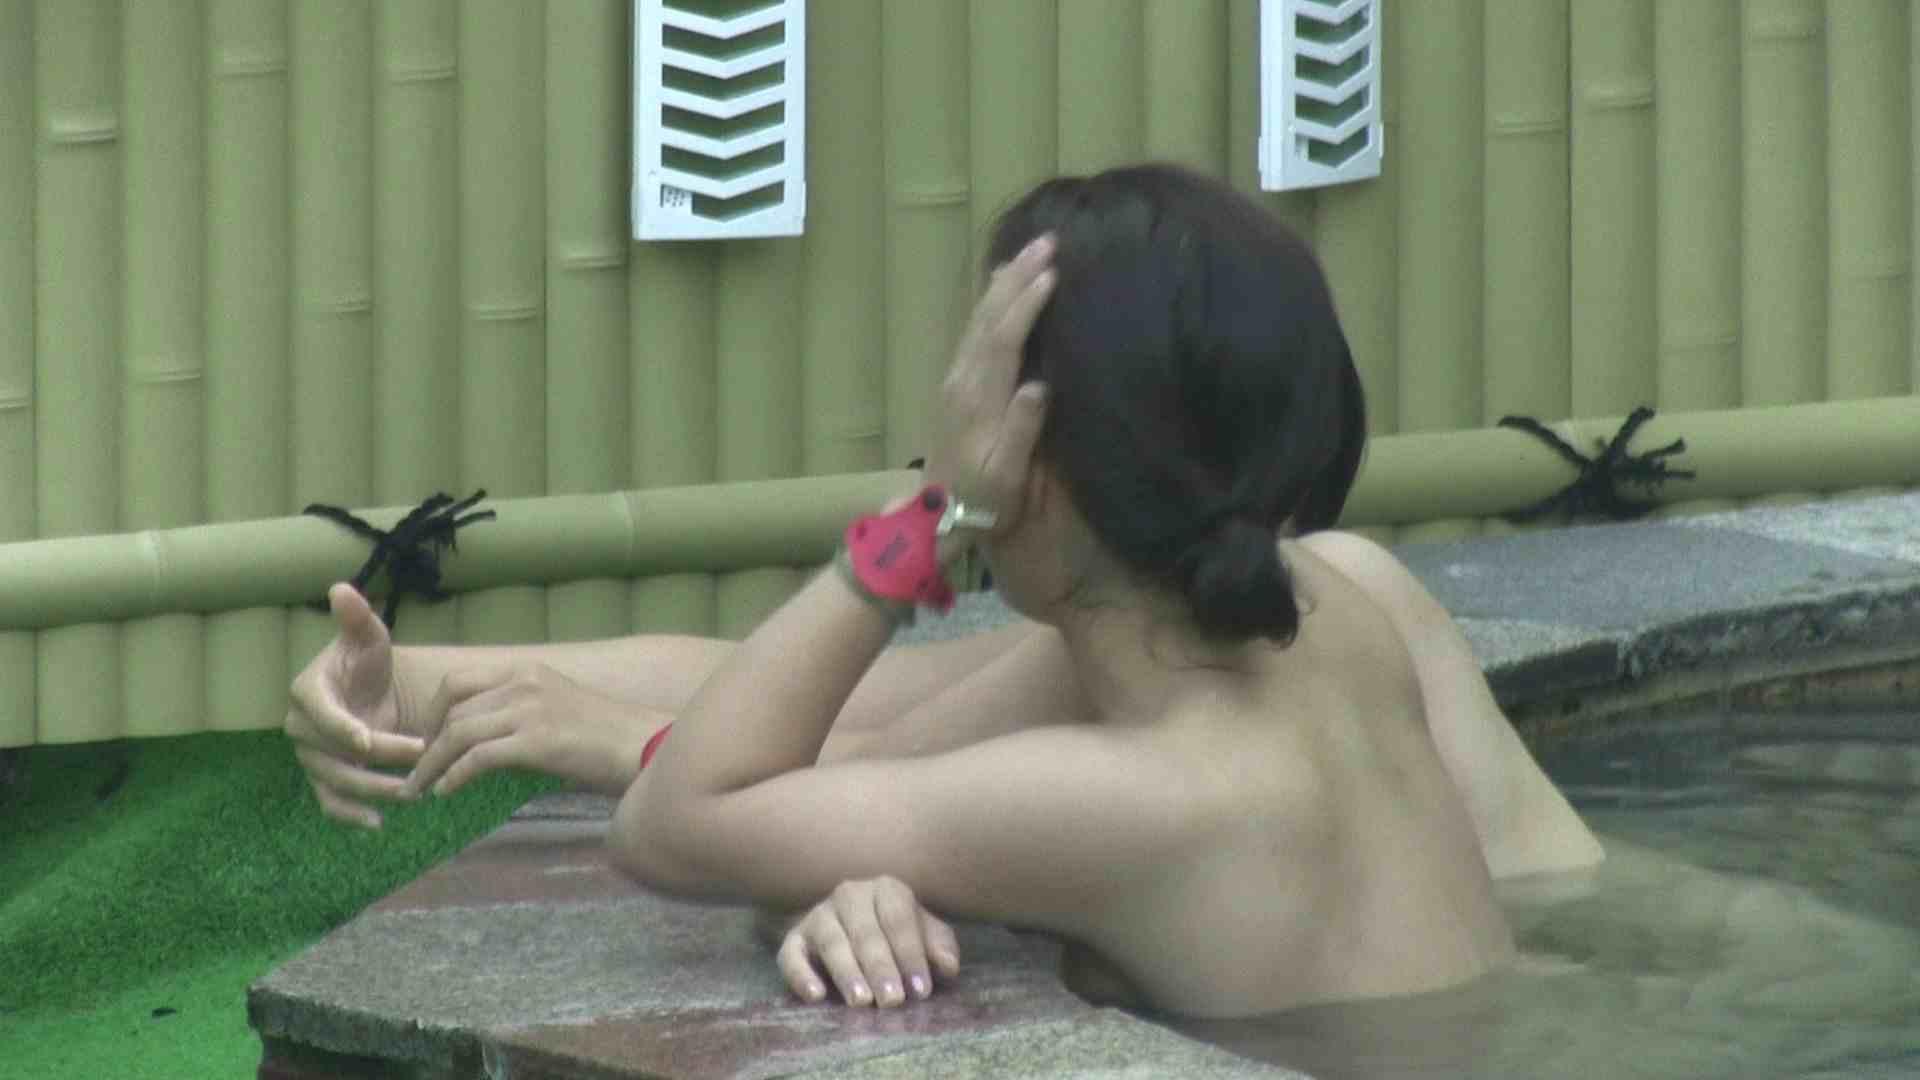 Aquaな露天風呂Vol.182 盗撮 盗み撮り動画キャプチャ 80画像 5